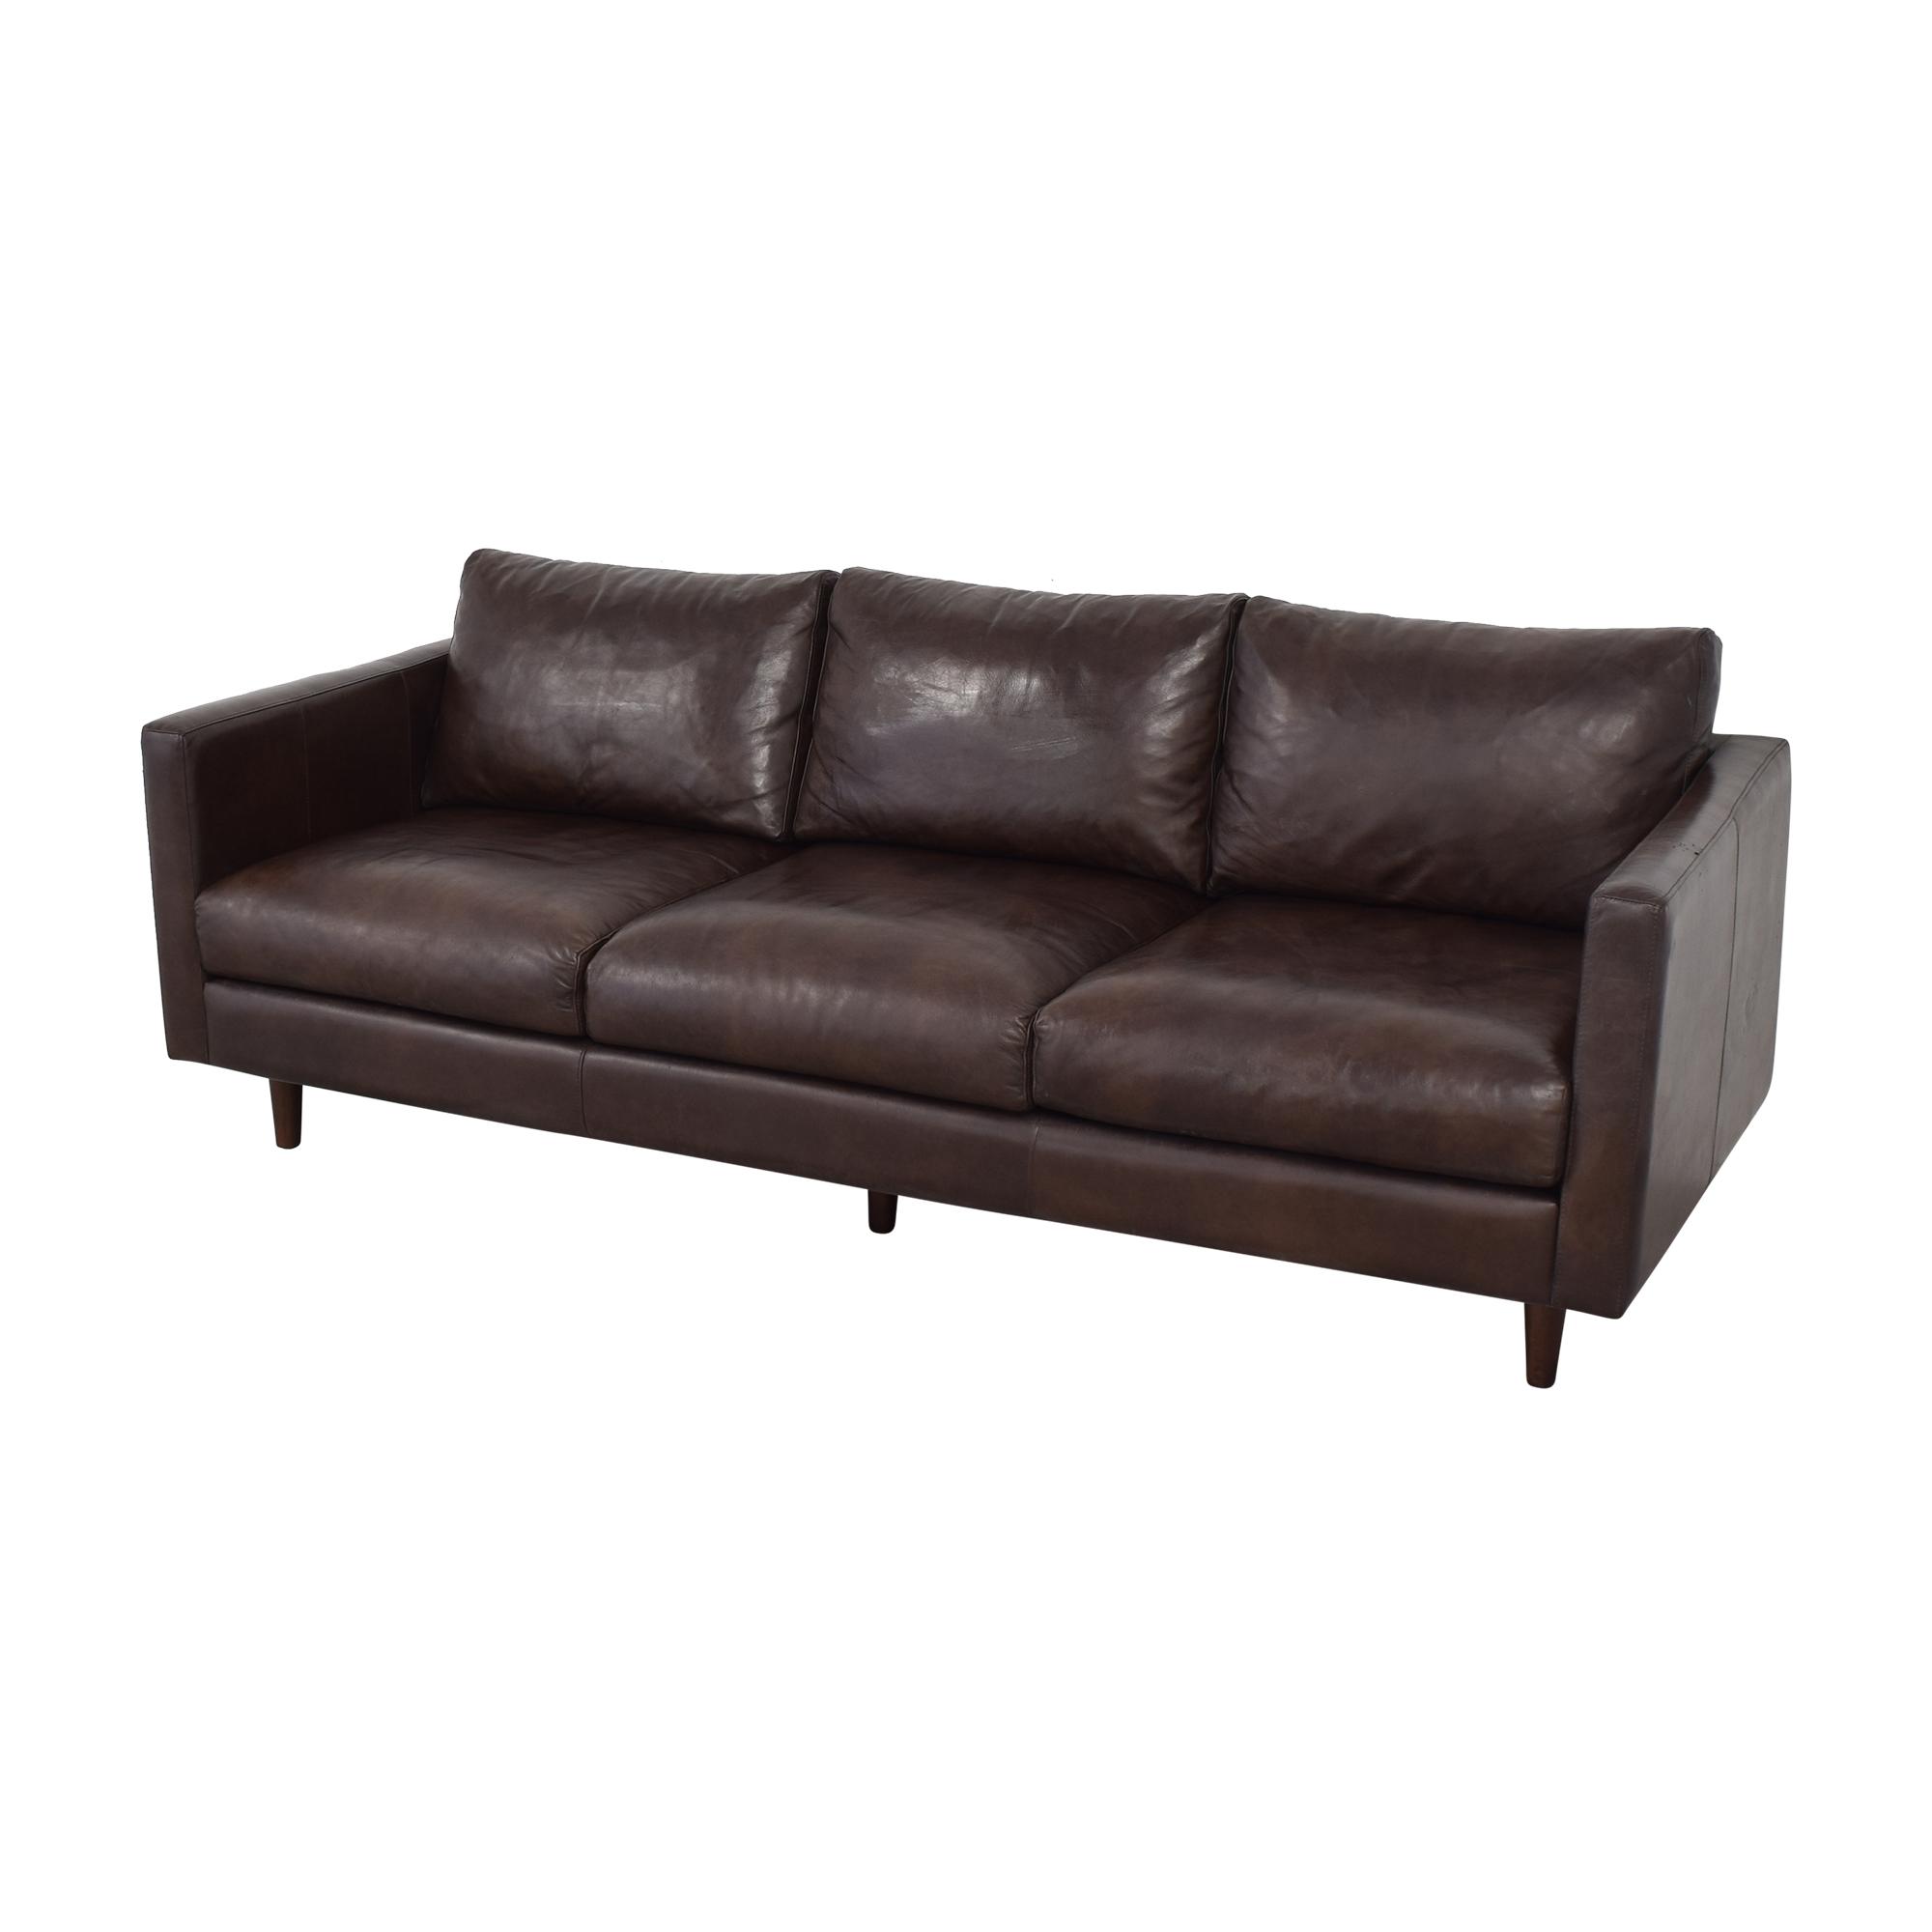 buy Strick & Bolton Beatnik Oxford Brown Leather Sofa Strick & Bolton Classic Sofas